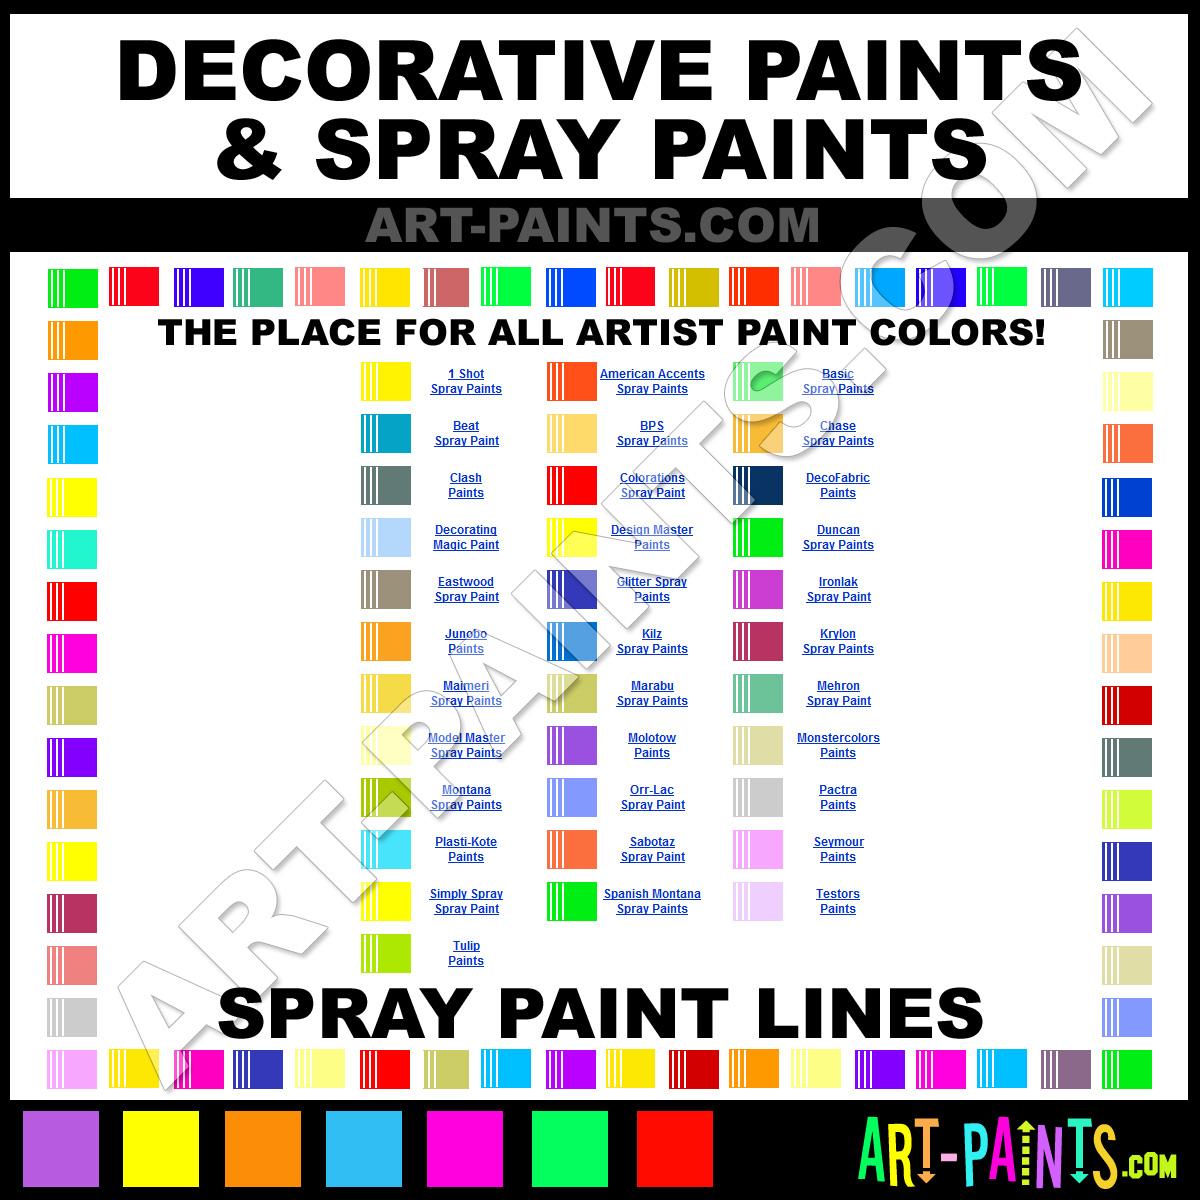 Spray Paints & Aerosol, Decorative, Graffiti Art Paints